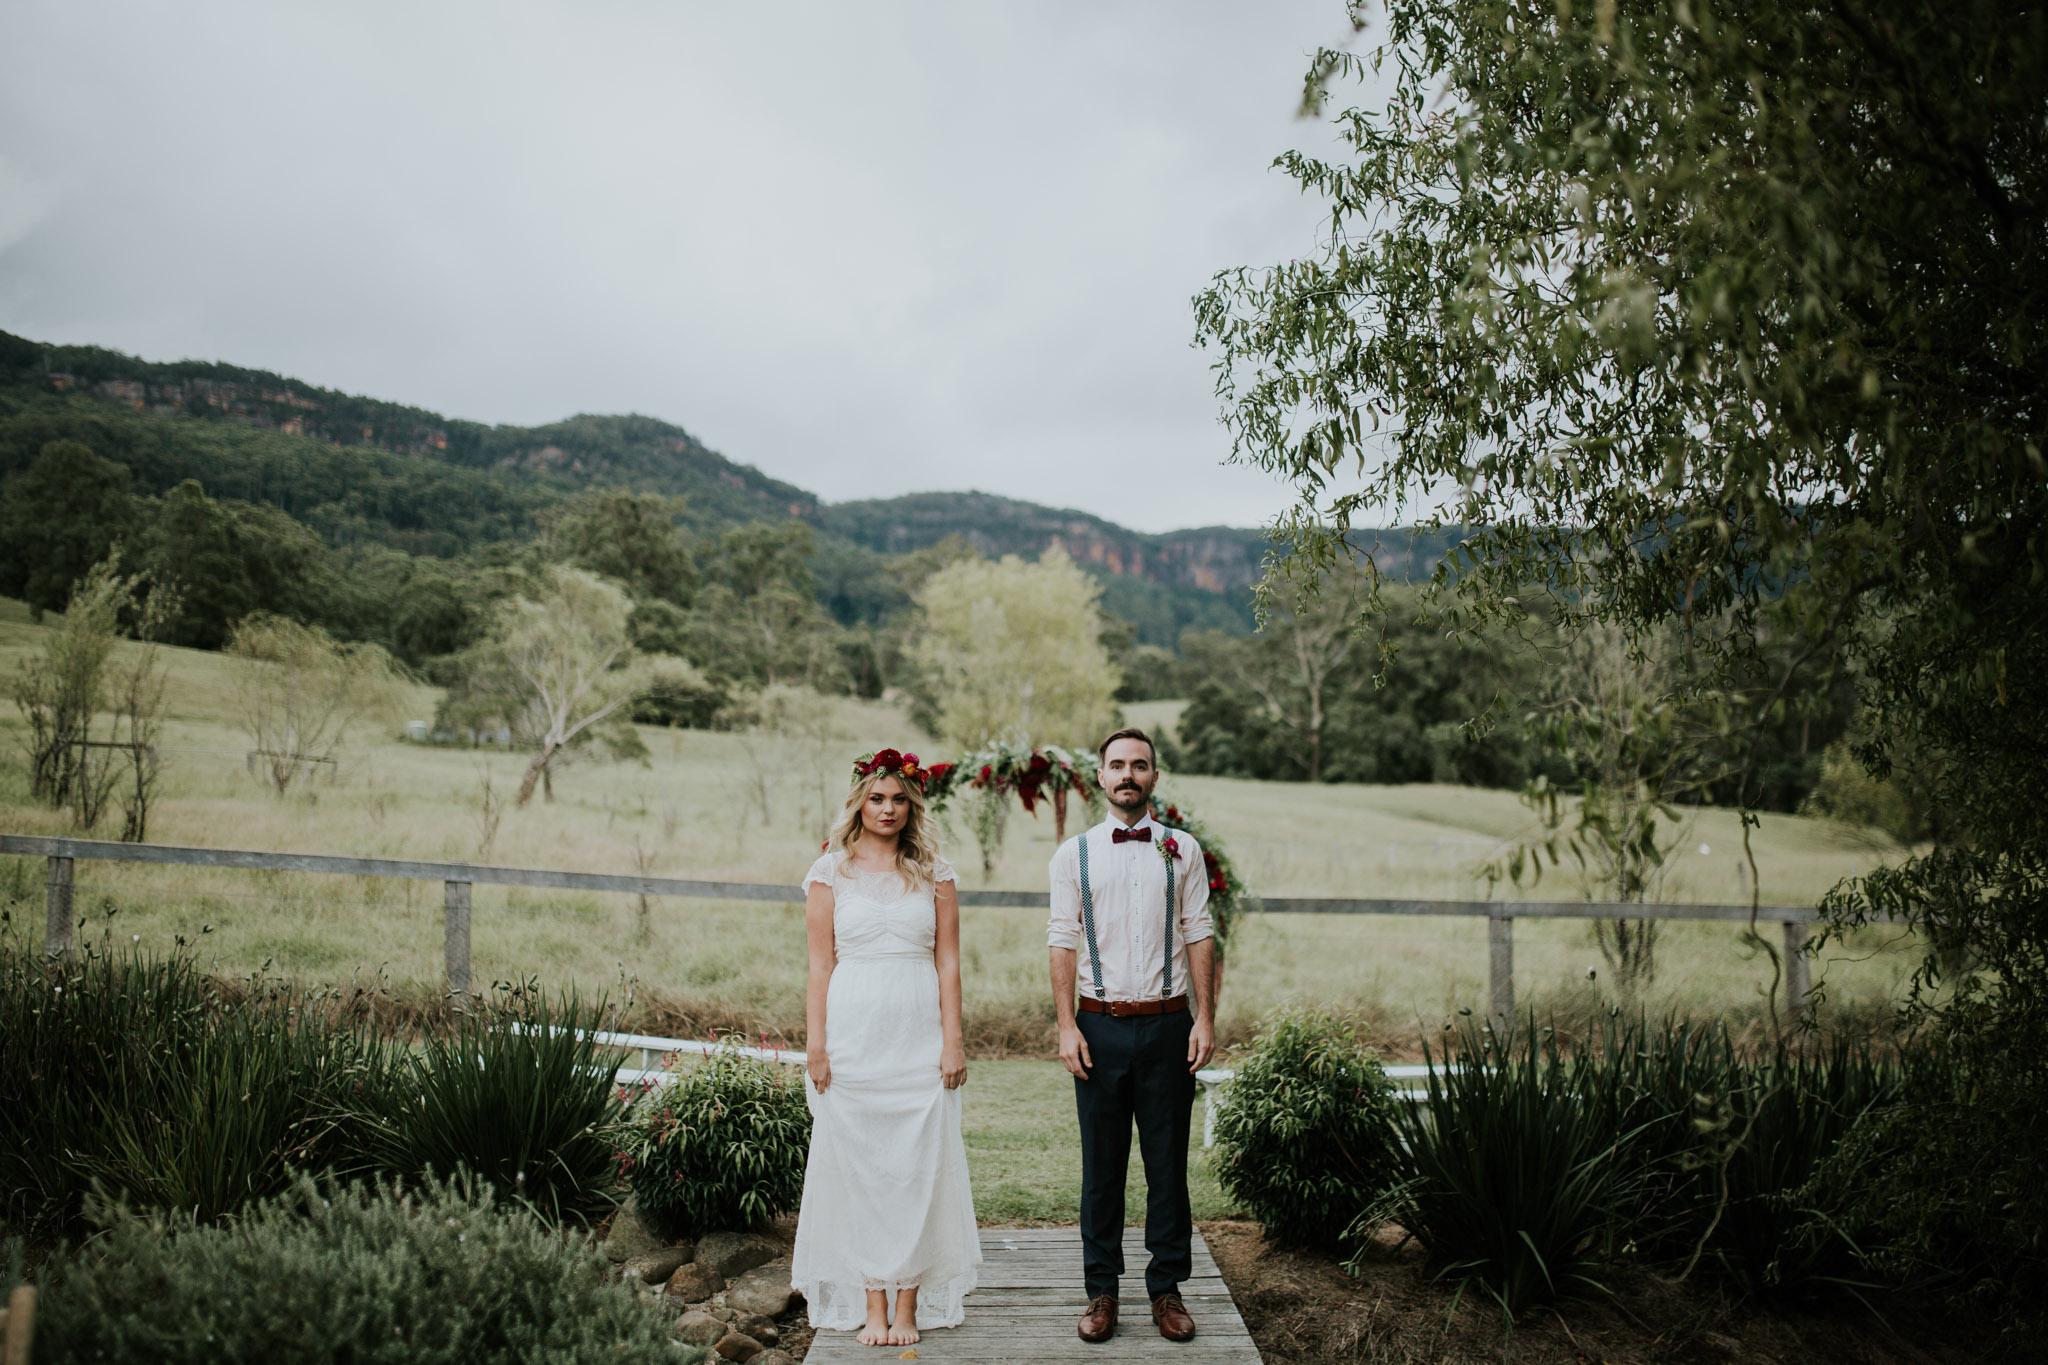 SPRING-GROVE-DAIRY-WEDDING-108.jpg